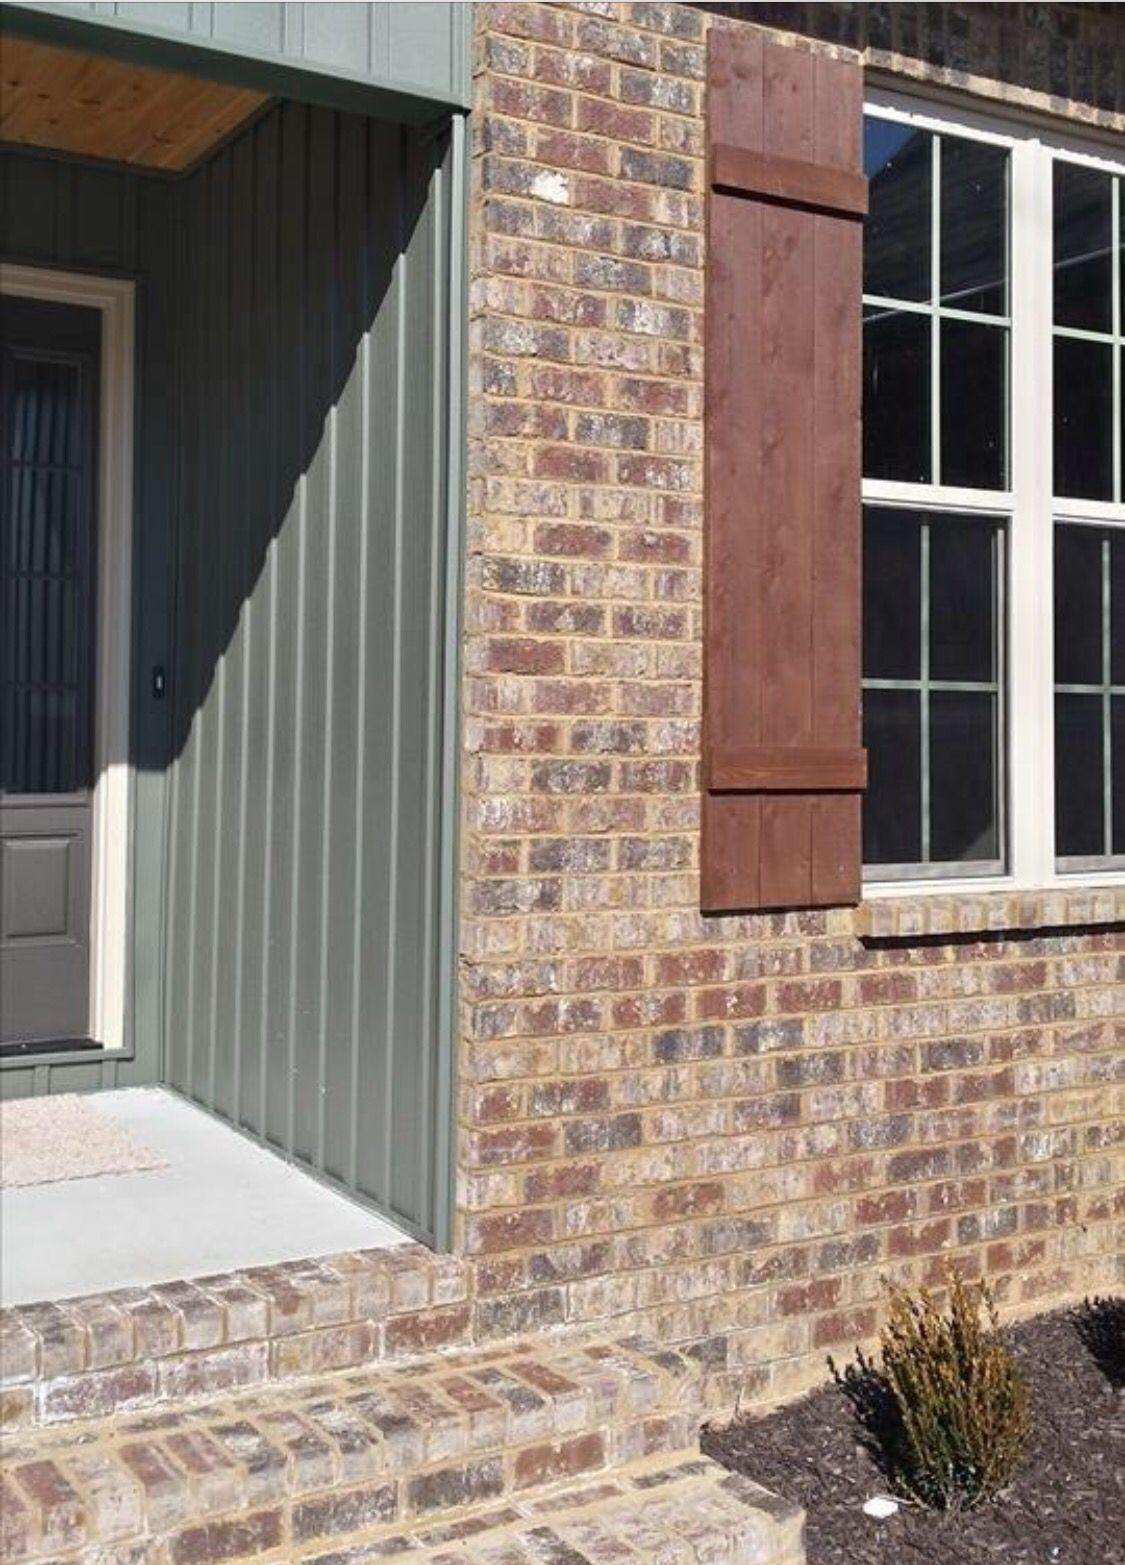 Pine Hall Brick Harbor Shoals Queen Brick With Antique